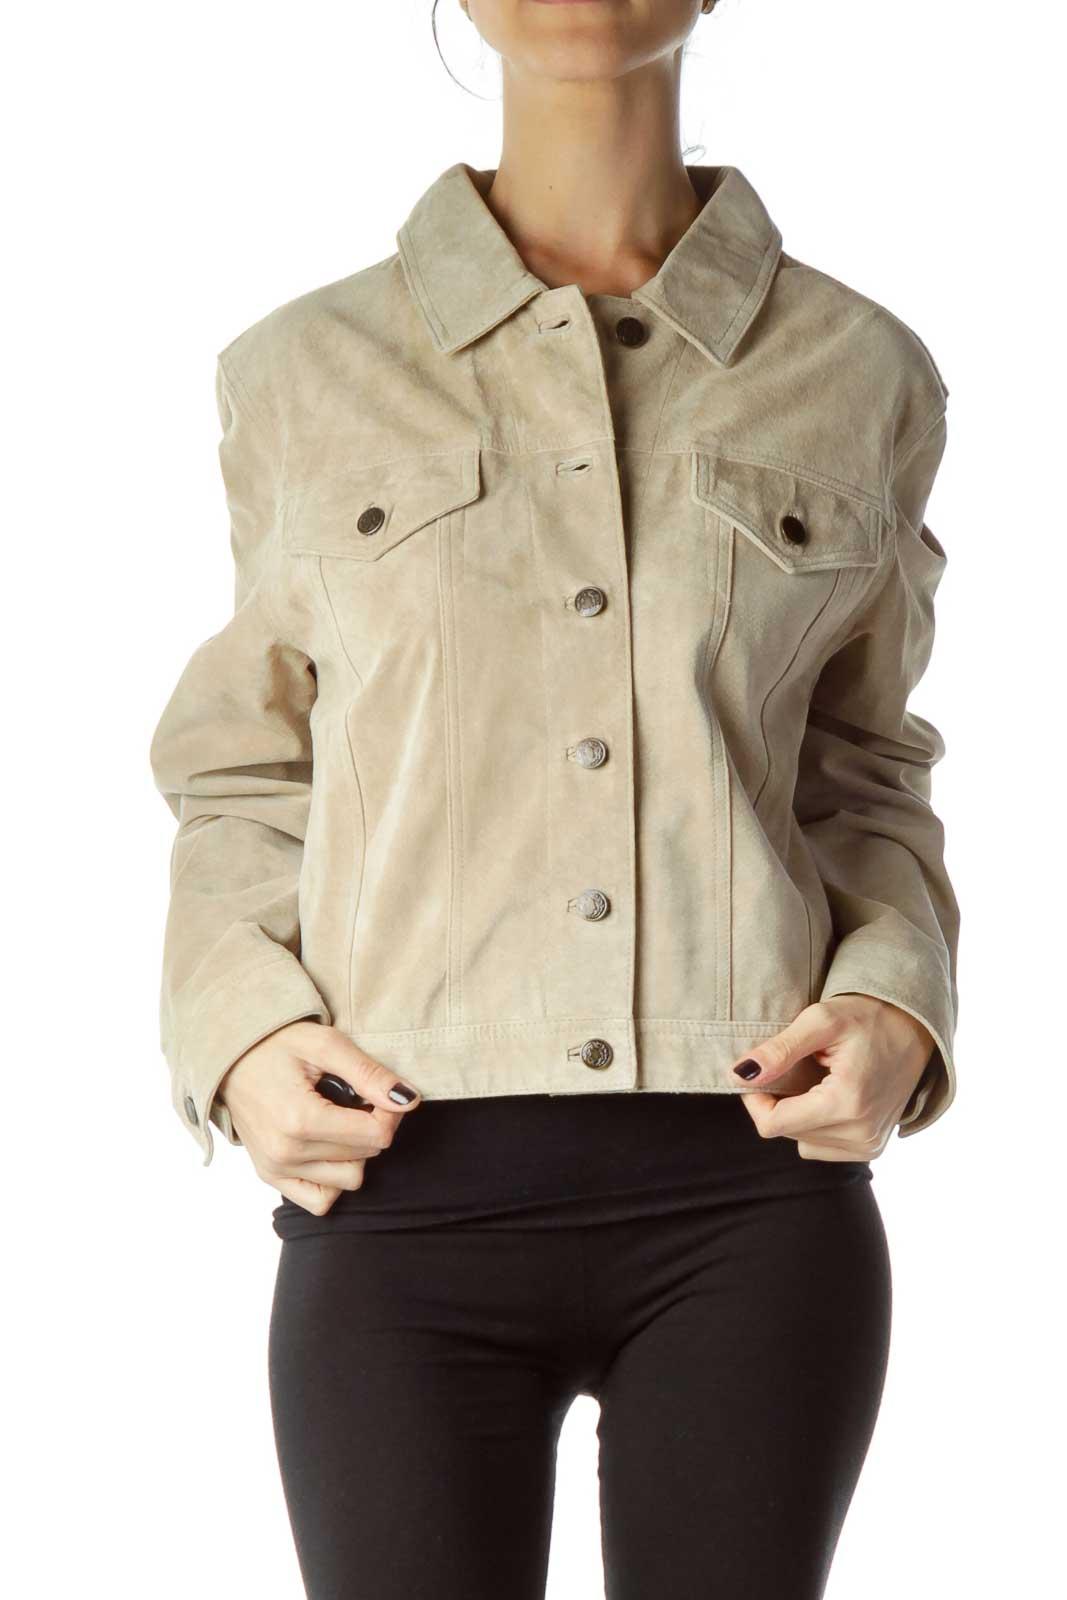 Beige Sued Button Down Jacket Front